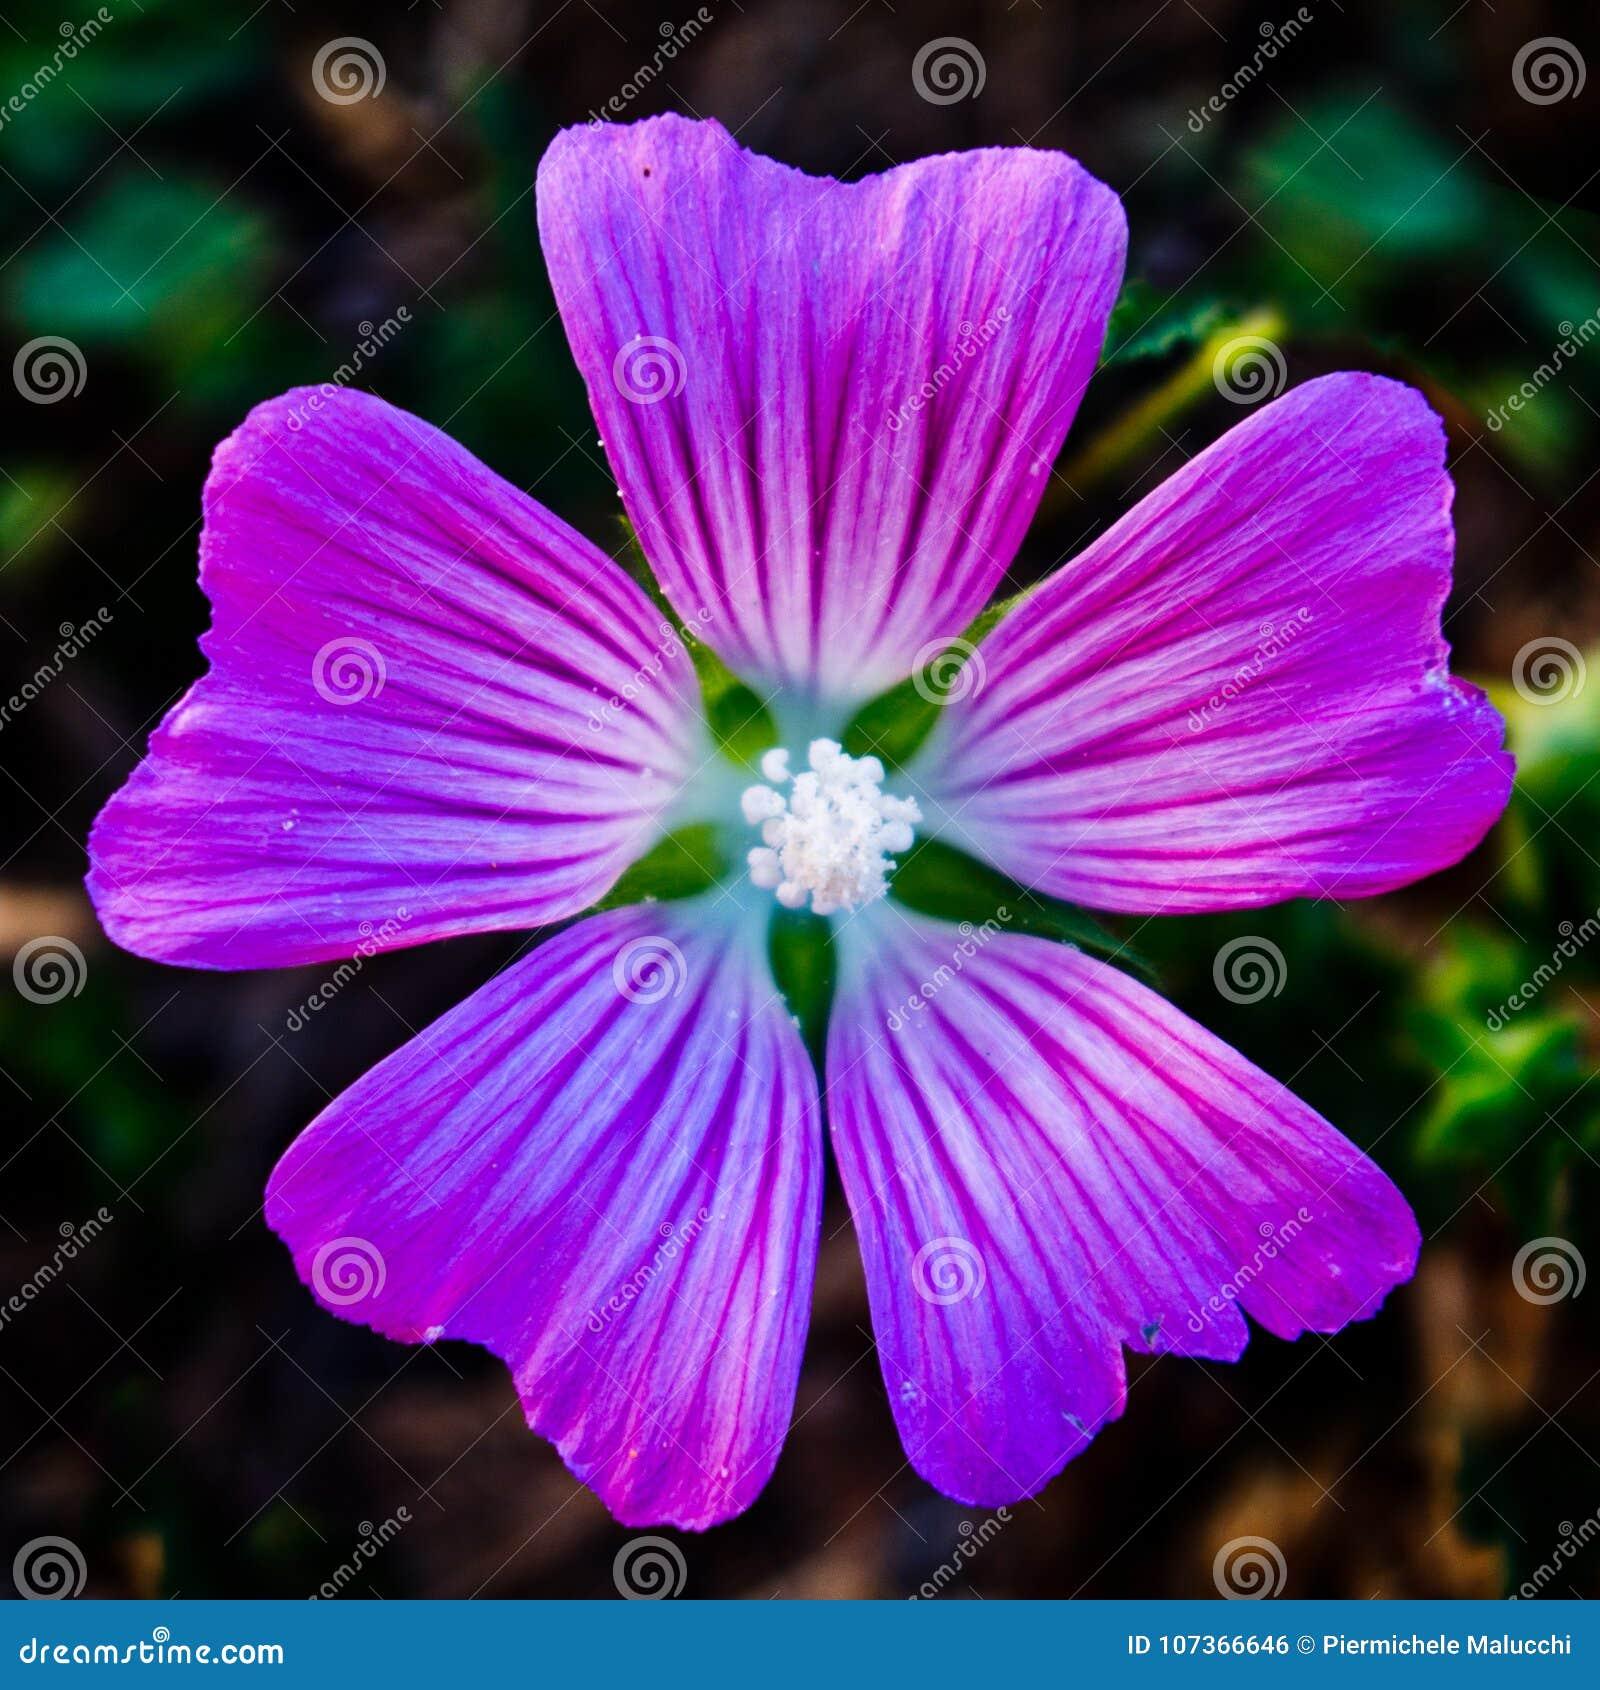 Small Light Purple Flower Stock Photo Image Of Beauty 107366646